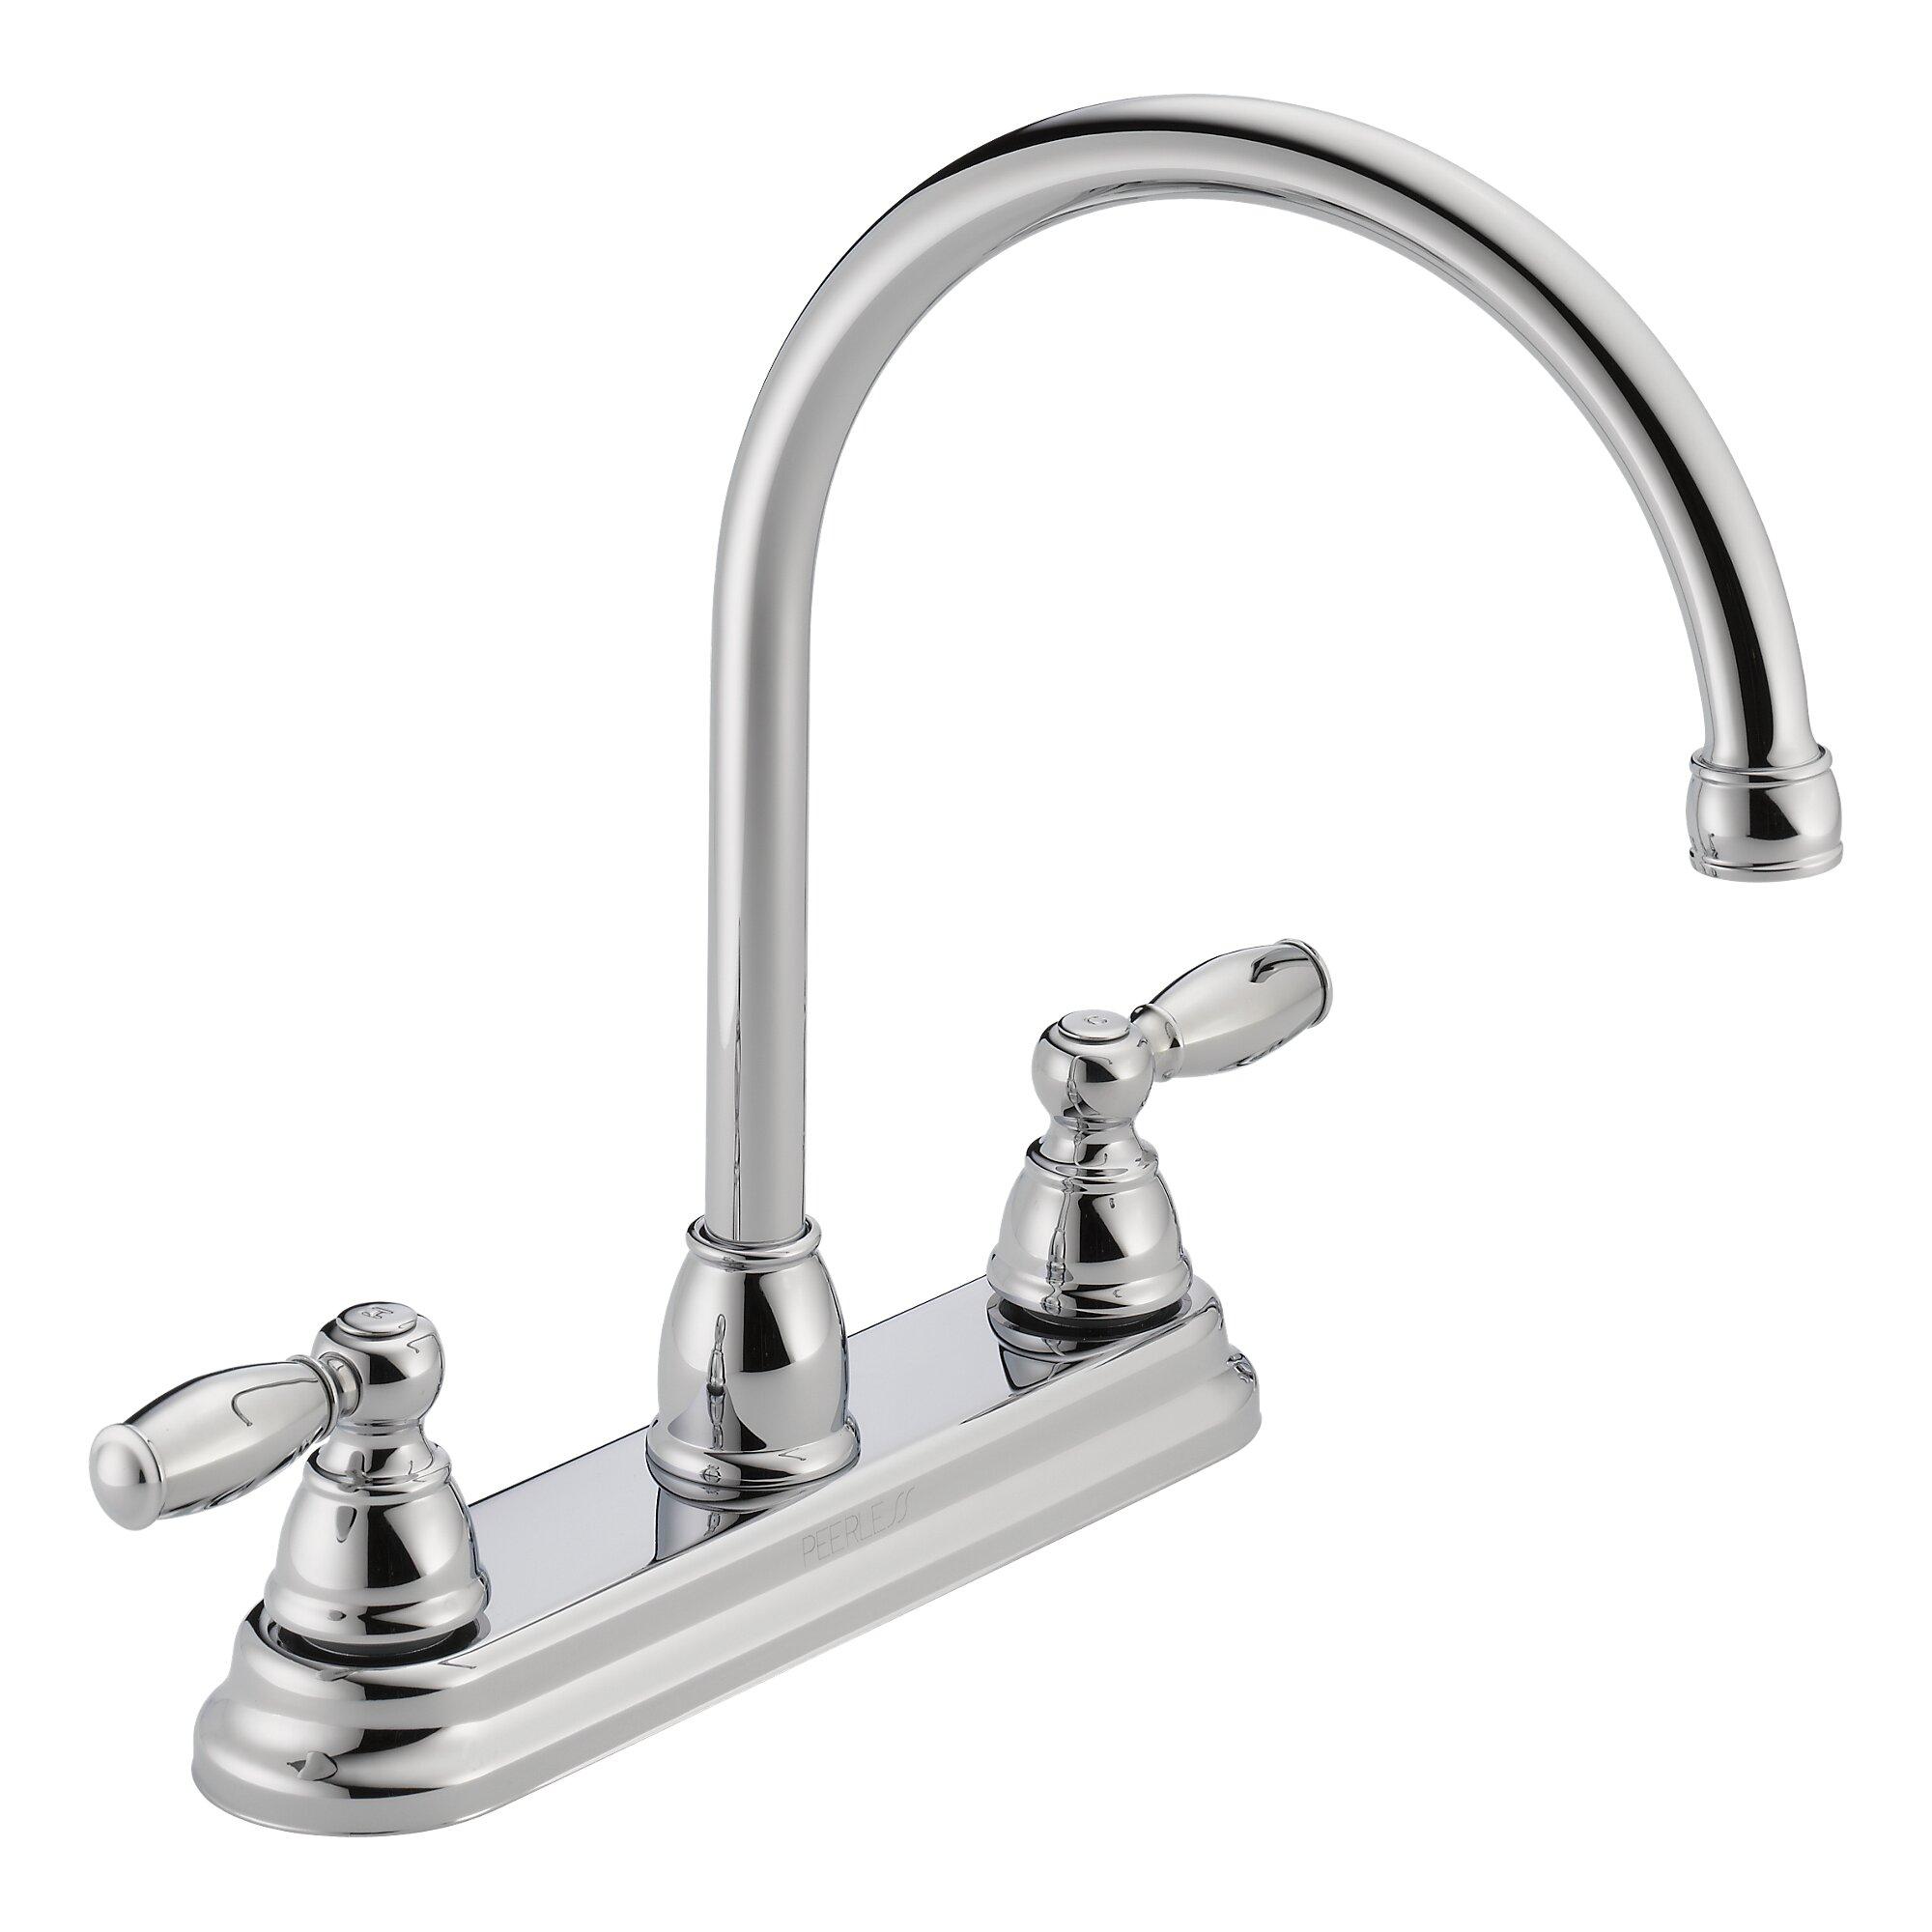 Double Handle Kitchen Faucet Peerless Faucets Apex Double Handle Kitchen Faucet Wayfair